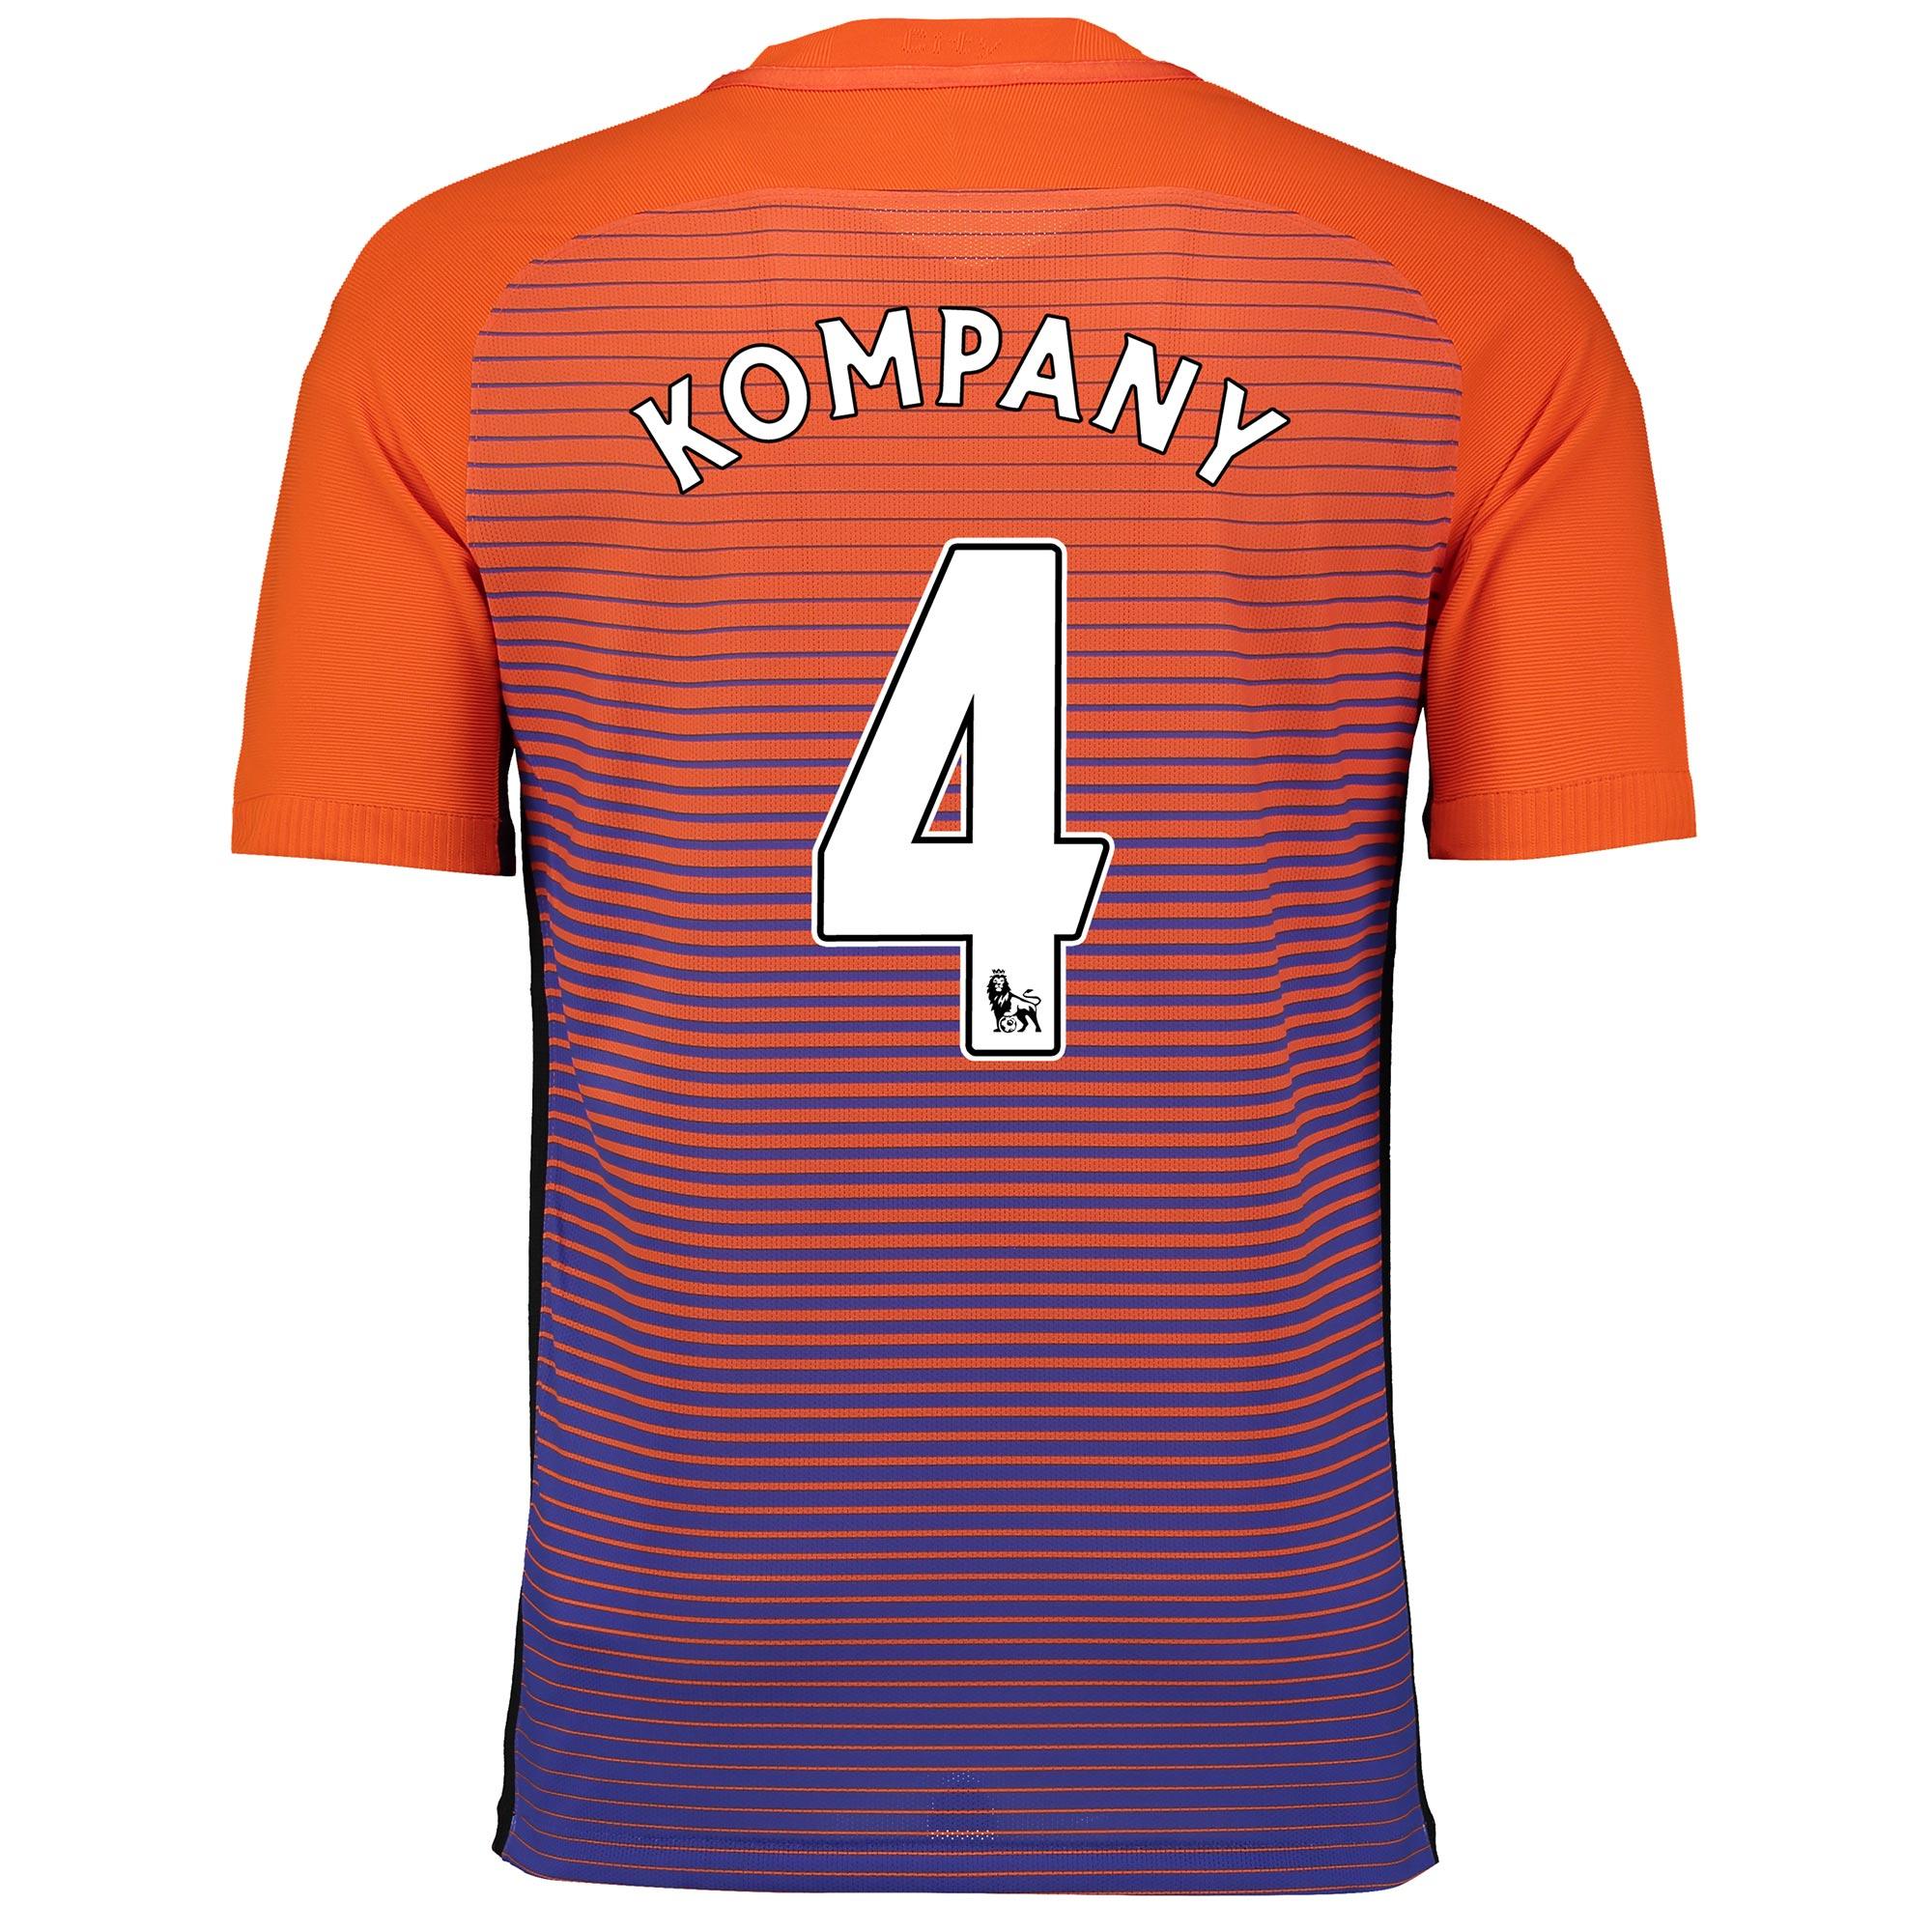 Manchester City Third Vapor Match Shirt 2016-17 with Kompany 4 printin